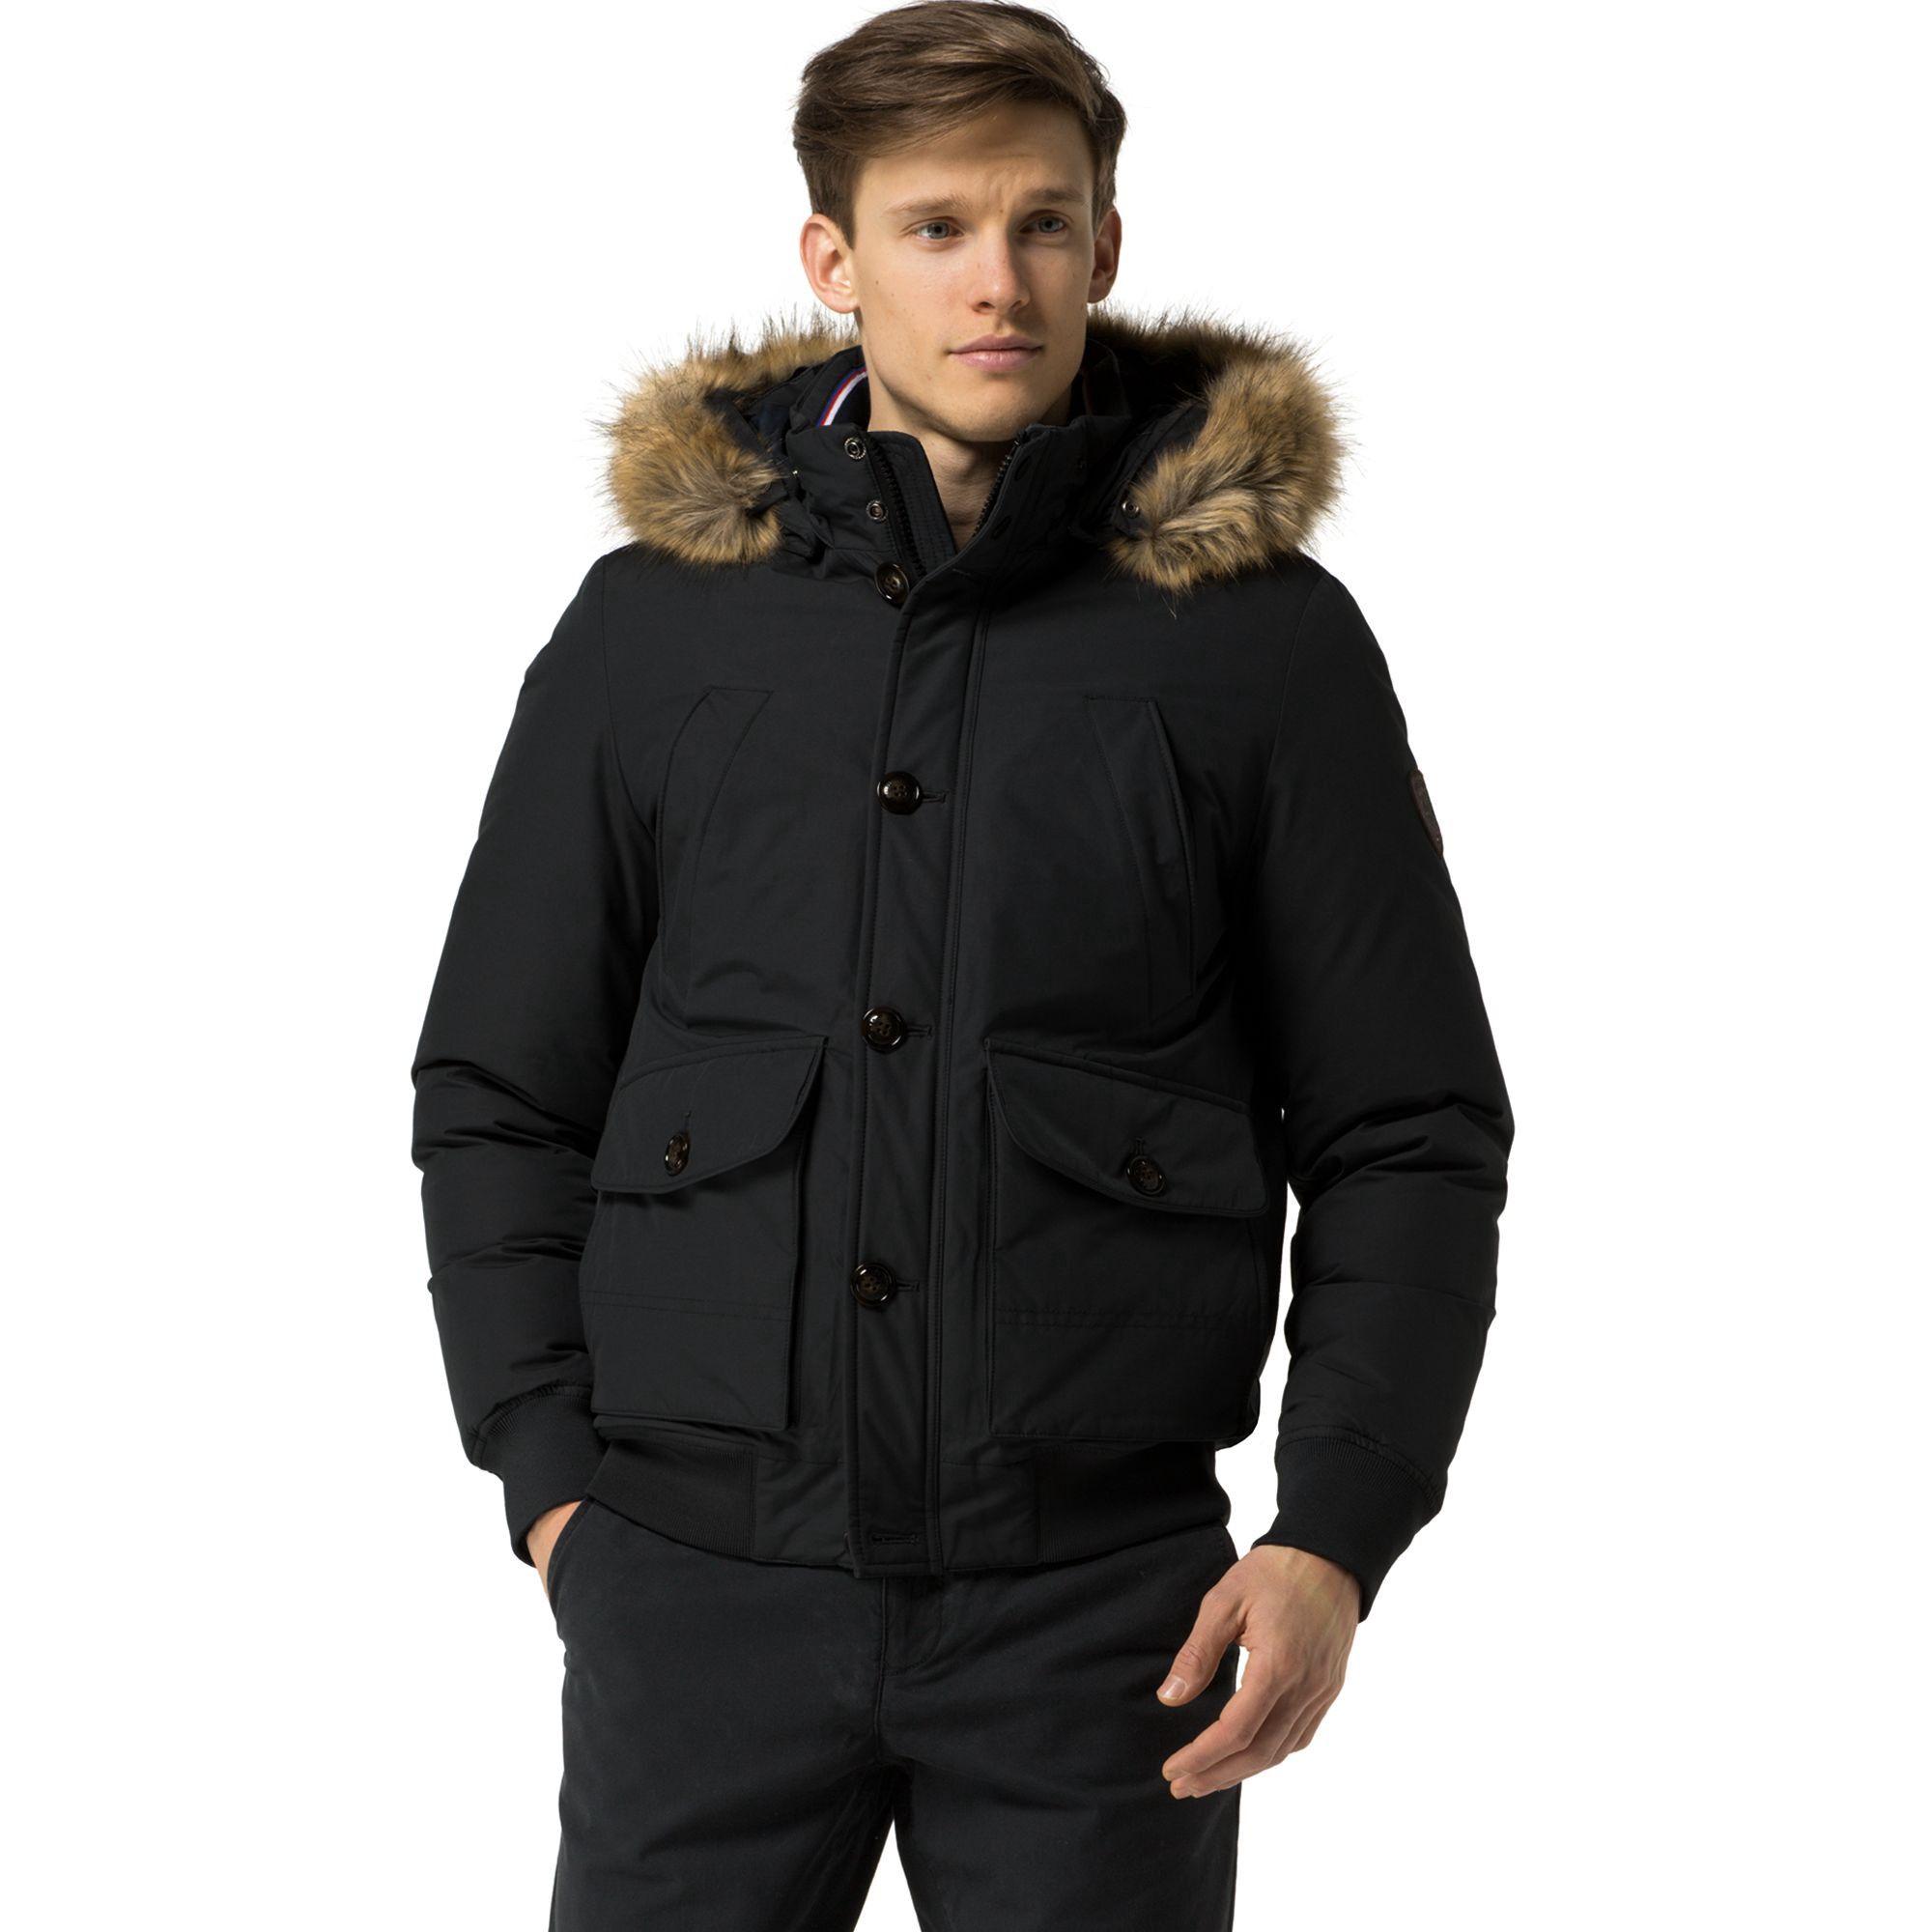 Tommy Hilfiger Tundra Down Bomber Grape Leaf Tommyhilfiger Cloth Winter Outfits Men Tommy Hilfiger Mens Jackets [ 2000 x 2000 Pixel ]